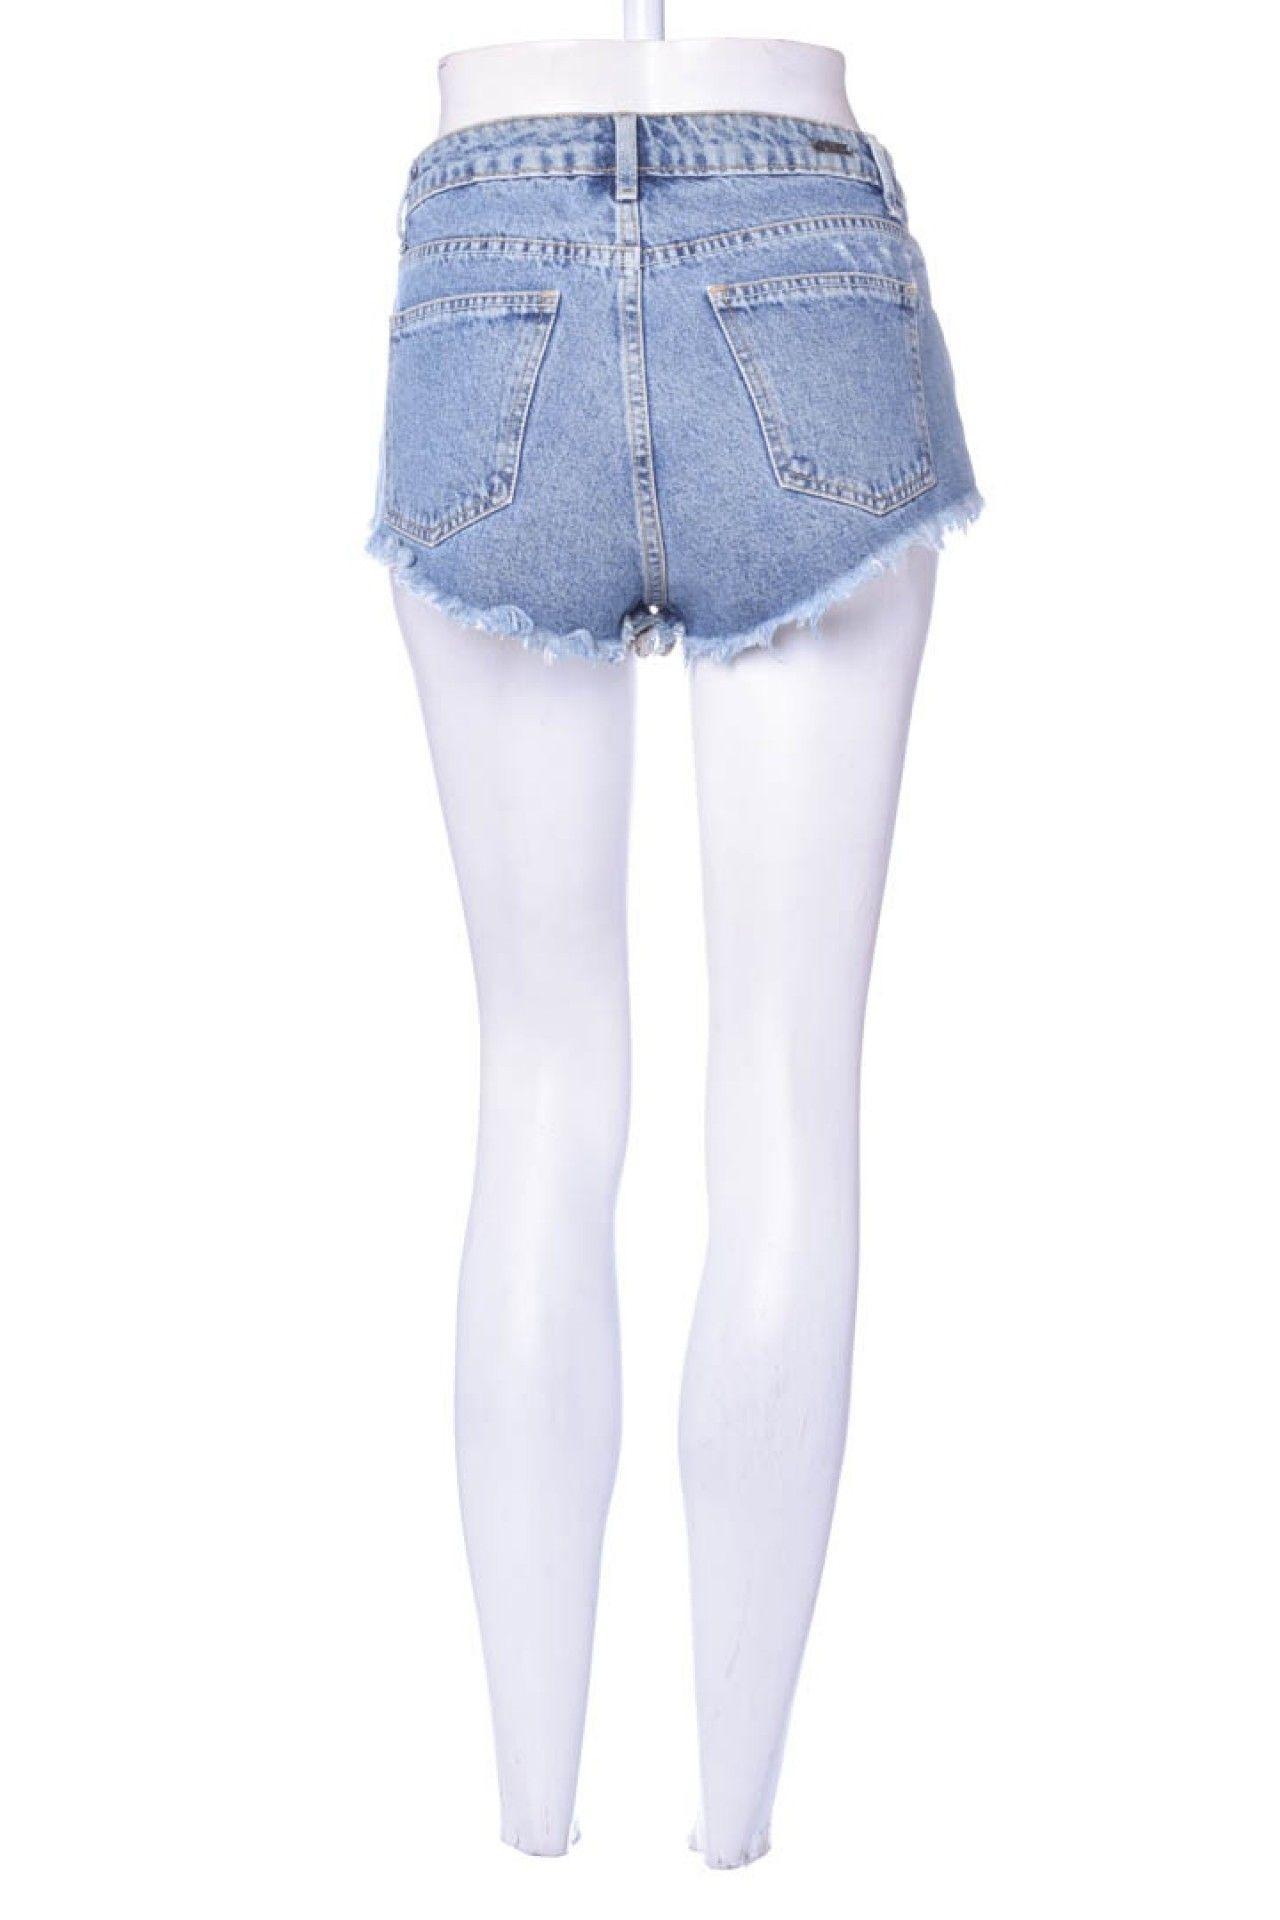 Espaço Fashion - Shorts Jeans Transpasse - Foto 3